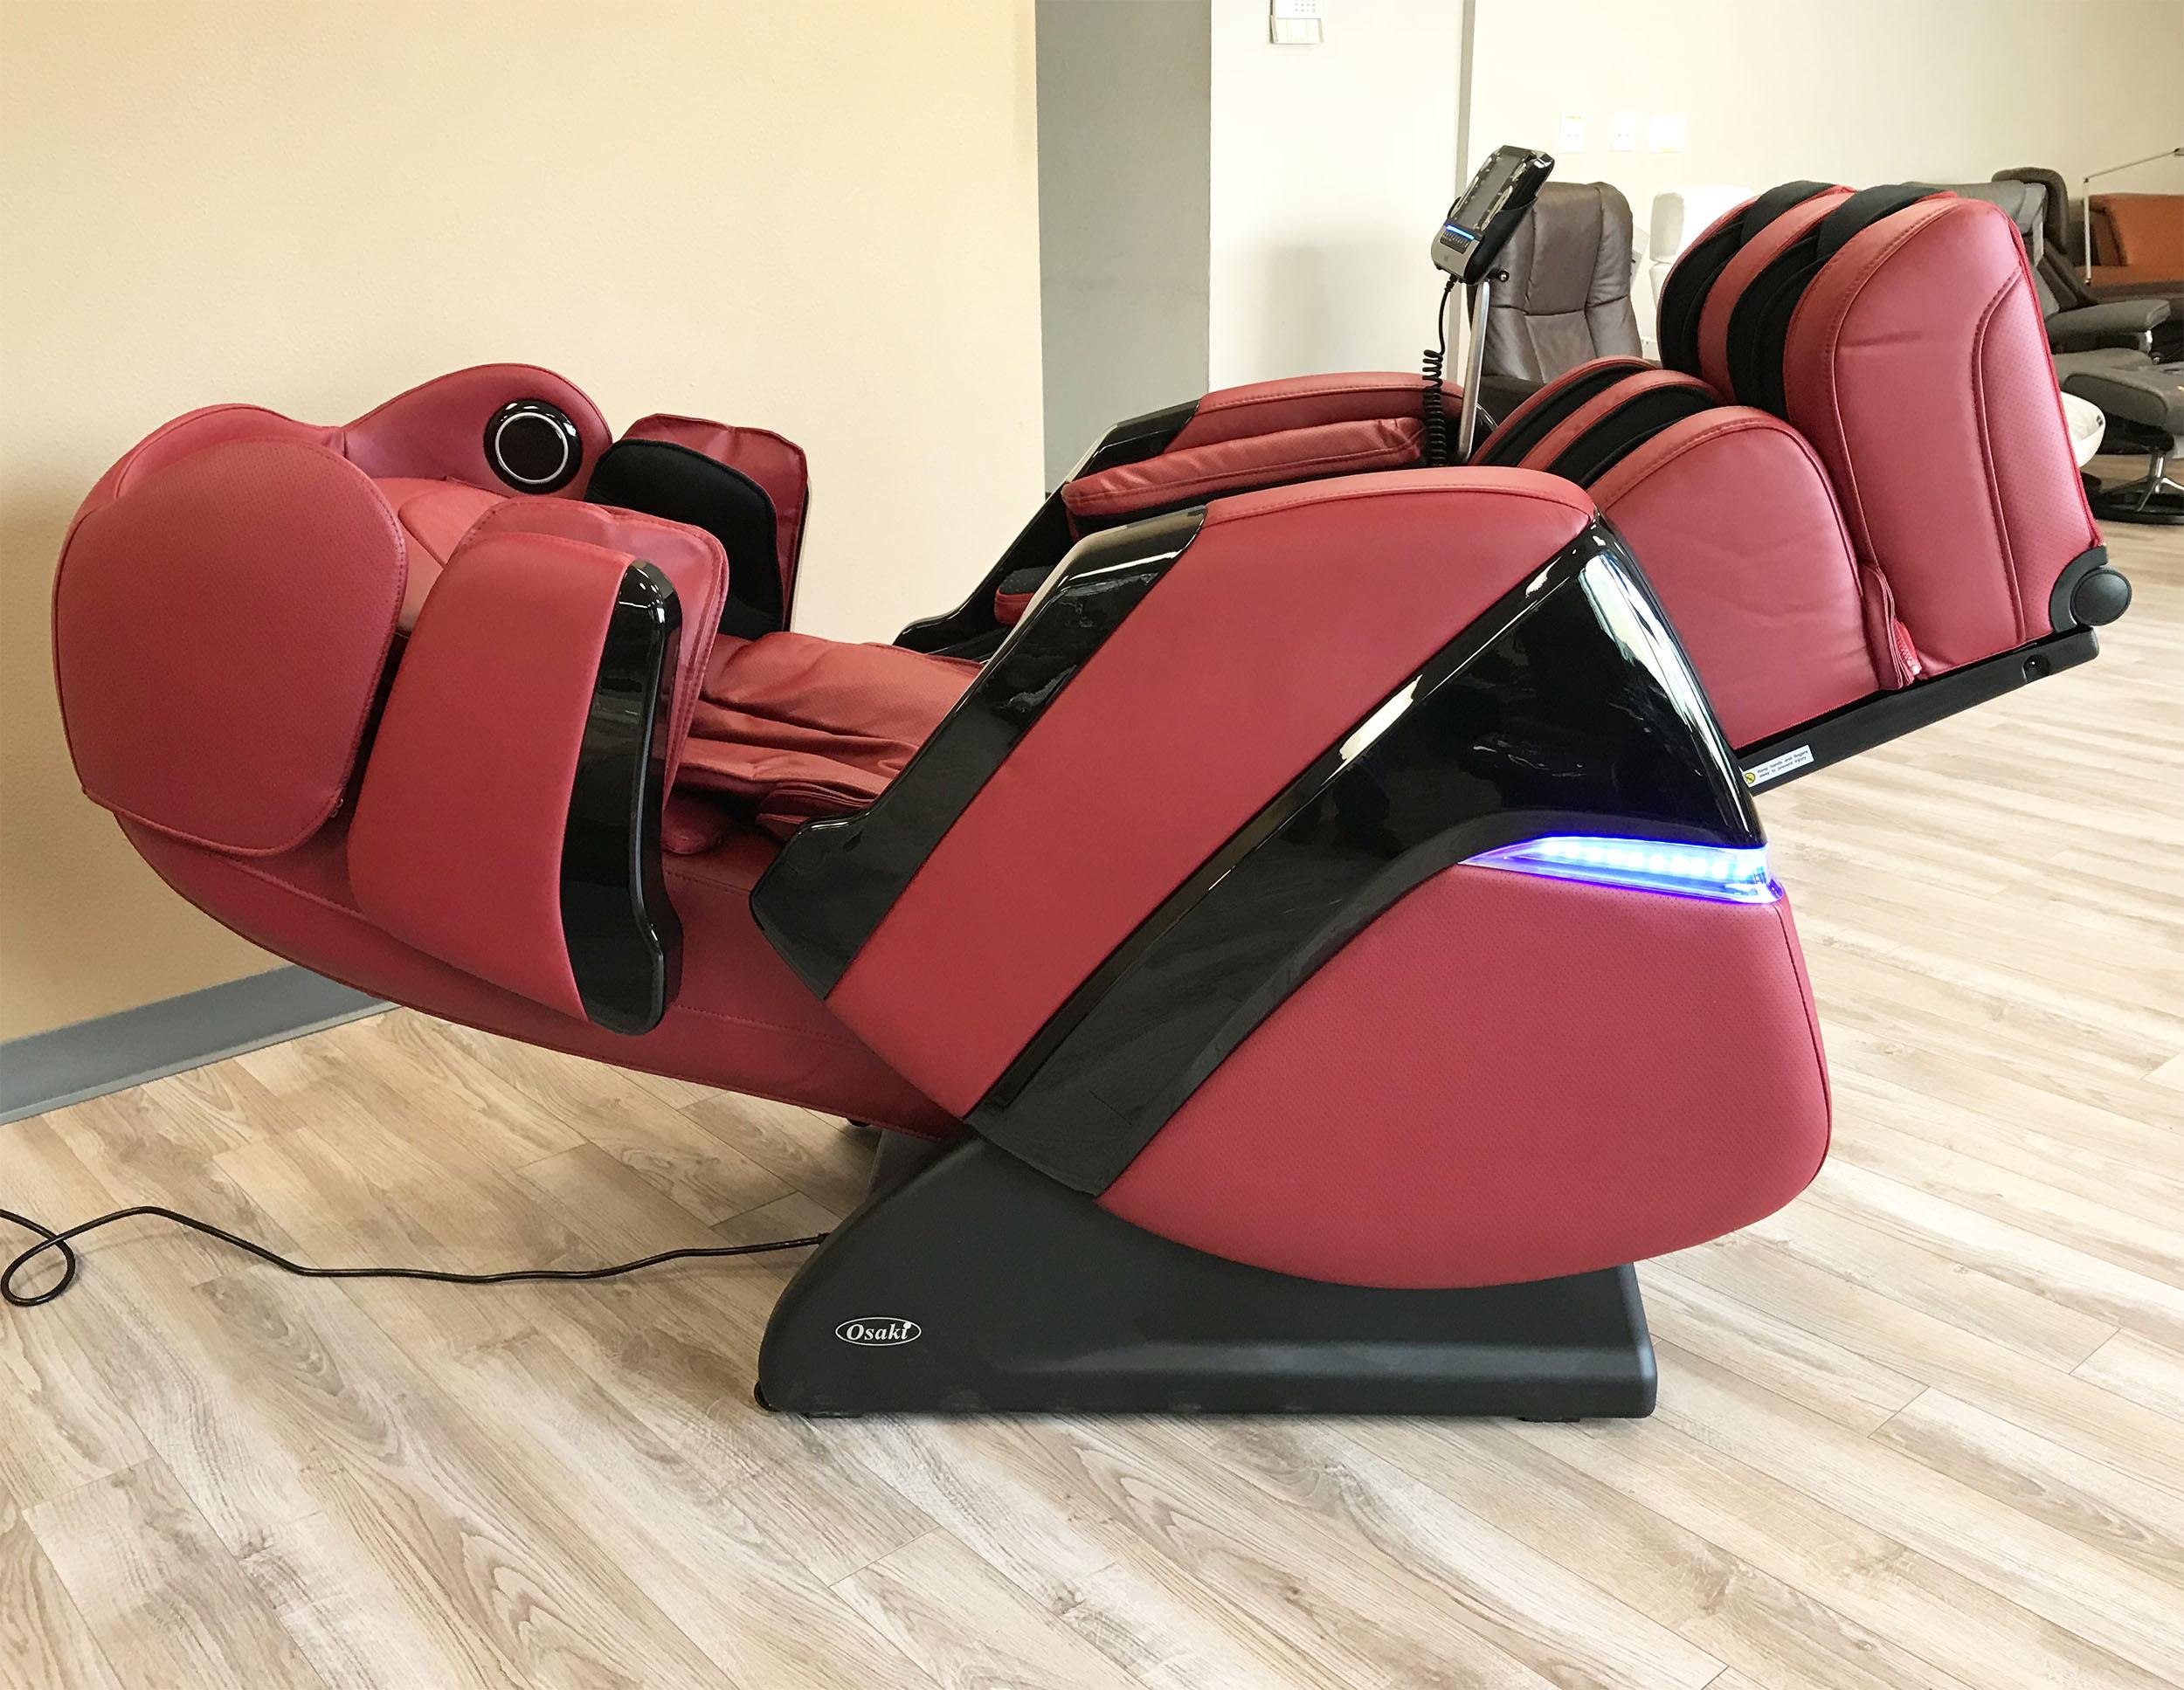 Osaki Massage Chair Zero Gravity Recliner Recliner and